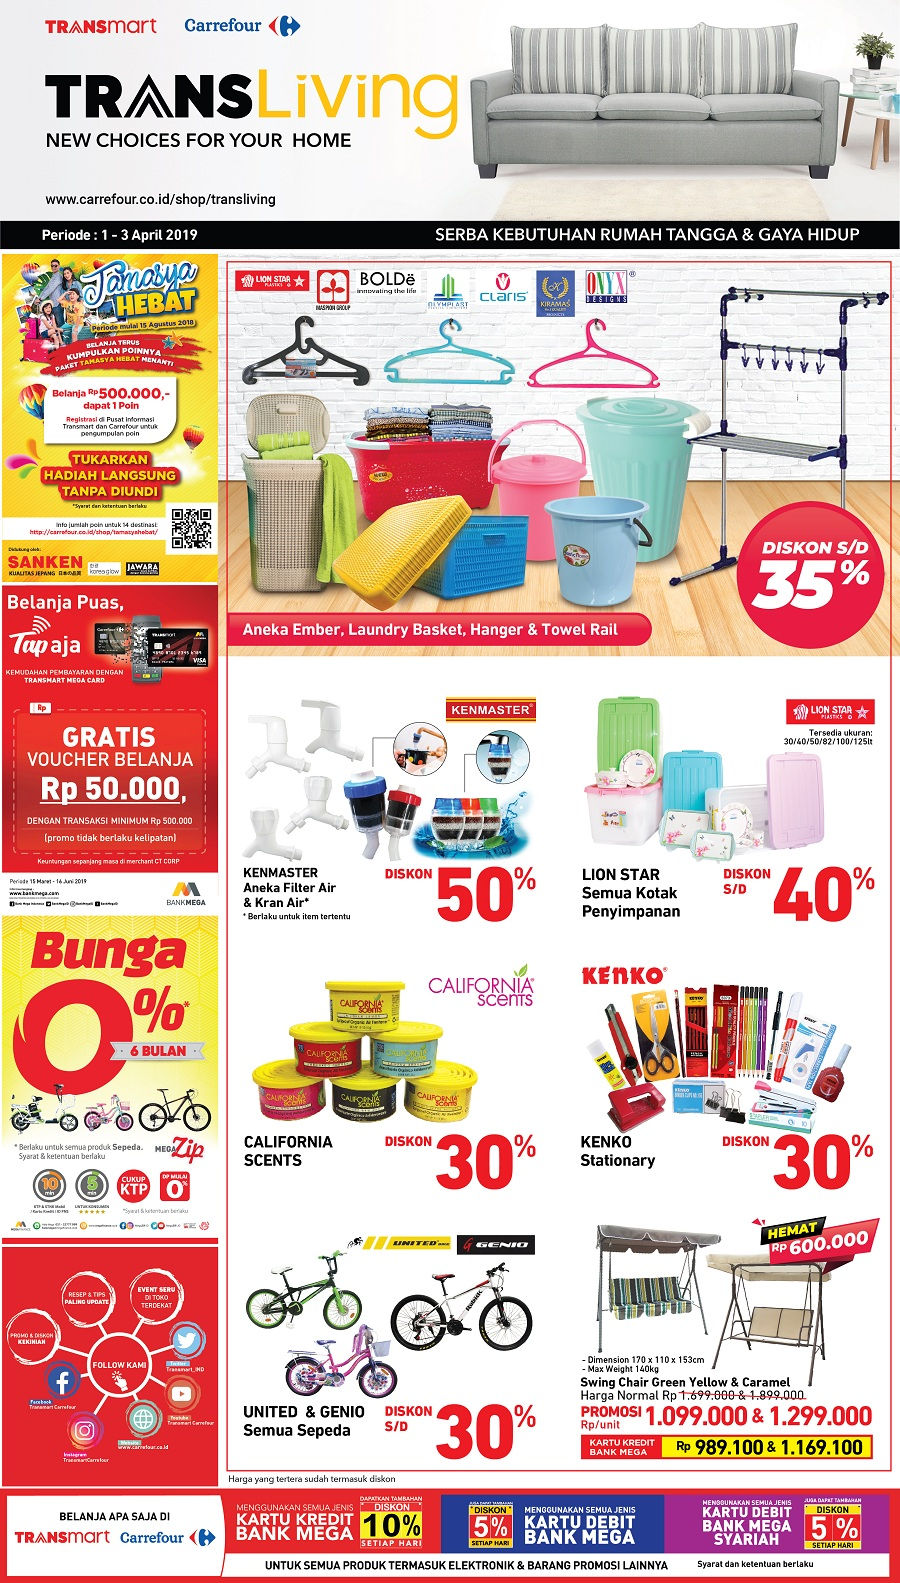 #Transmart #Carrefour - #Promo #Katalog JSM Periode 29 - 31 Maret 2019